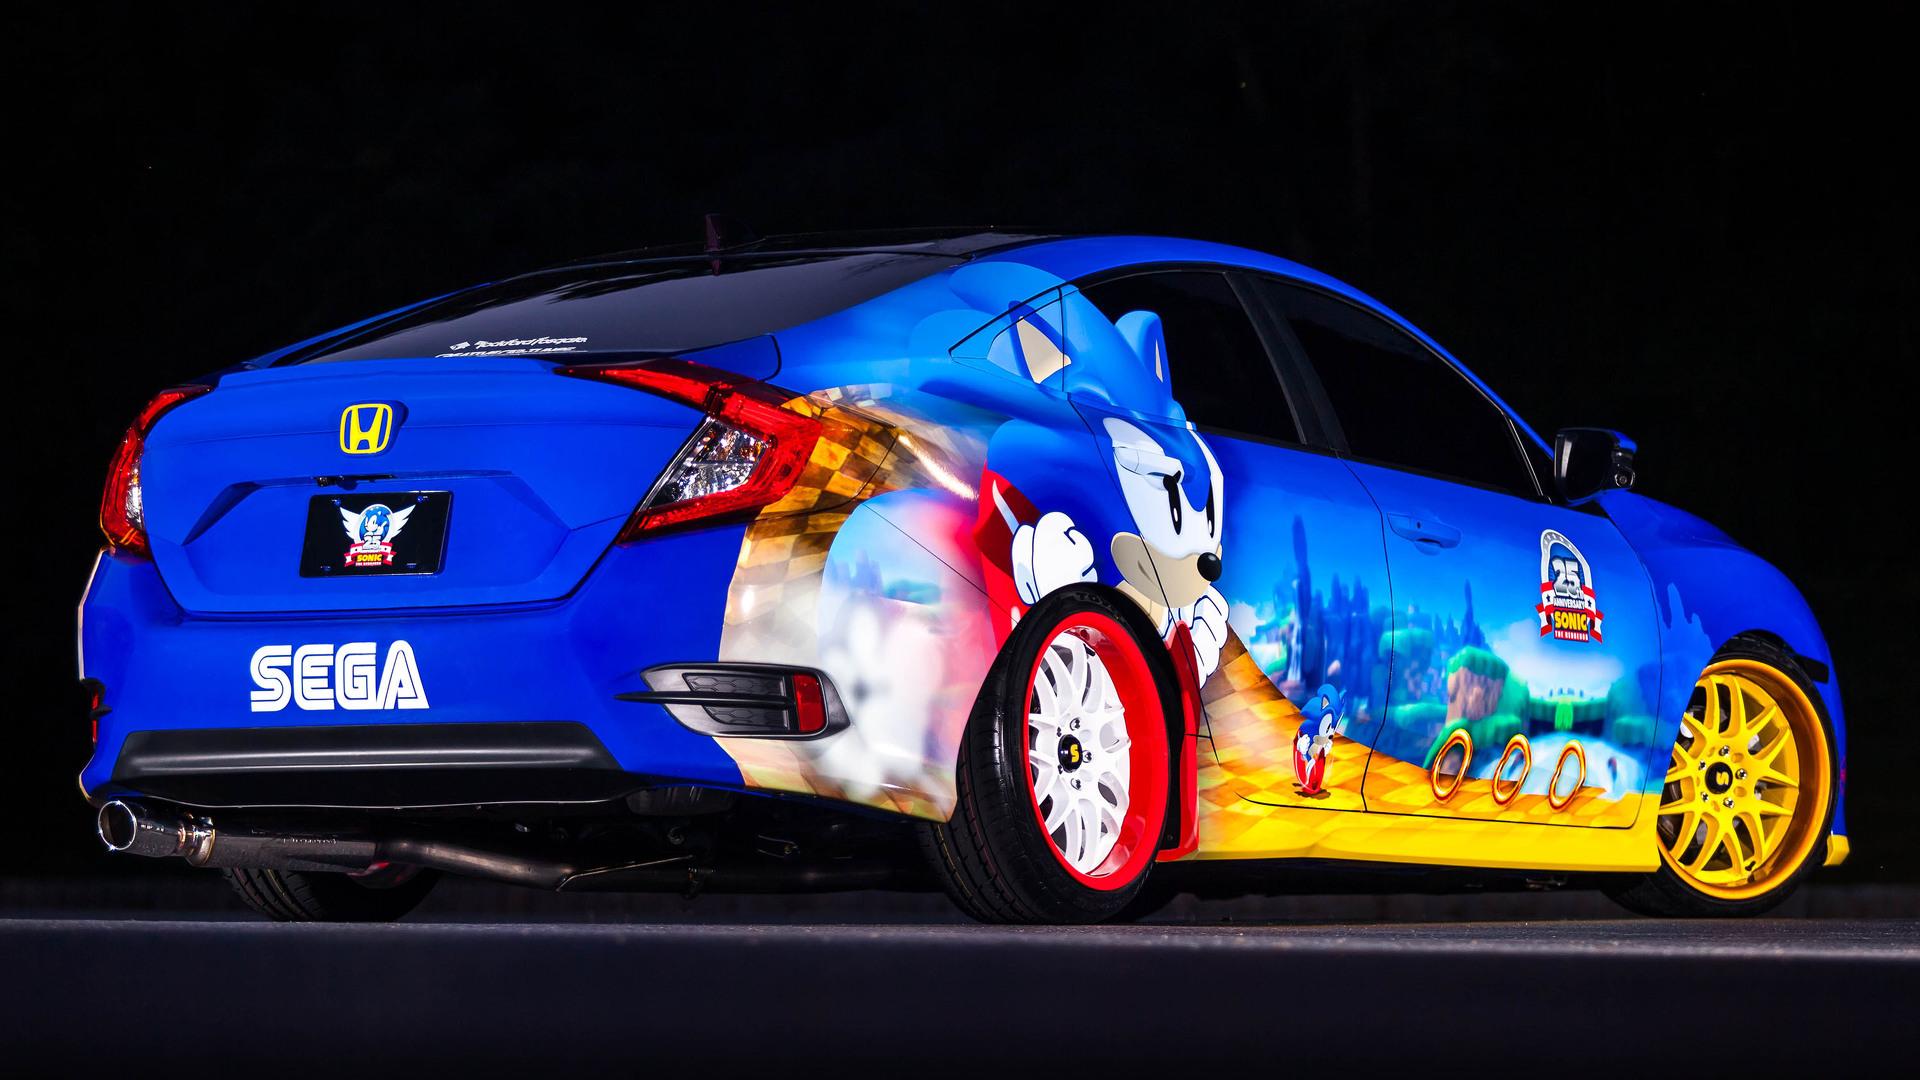 Honda Celebrates 25th Anniversary of Sonic - Image 03